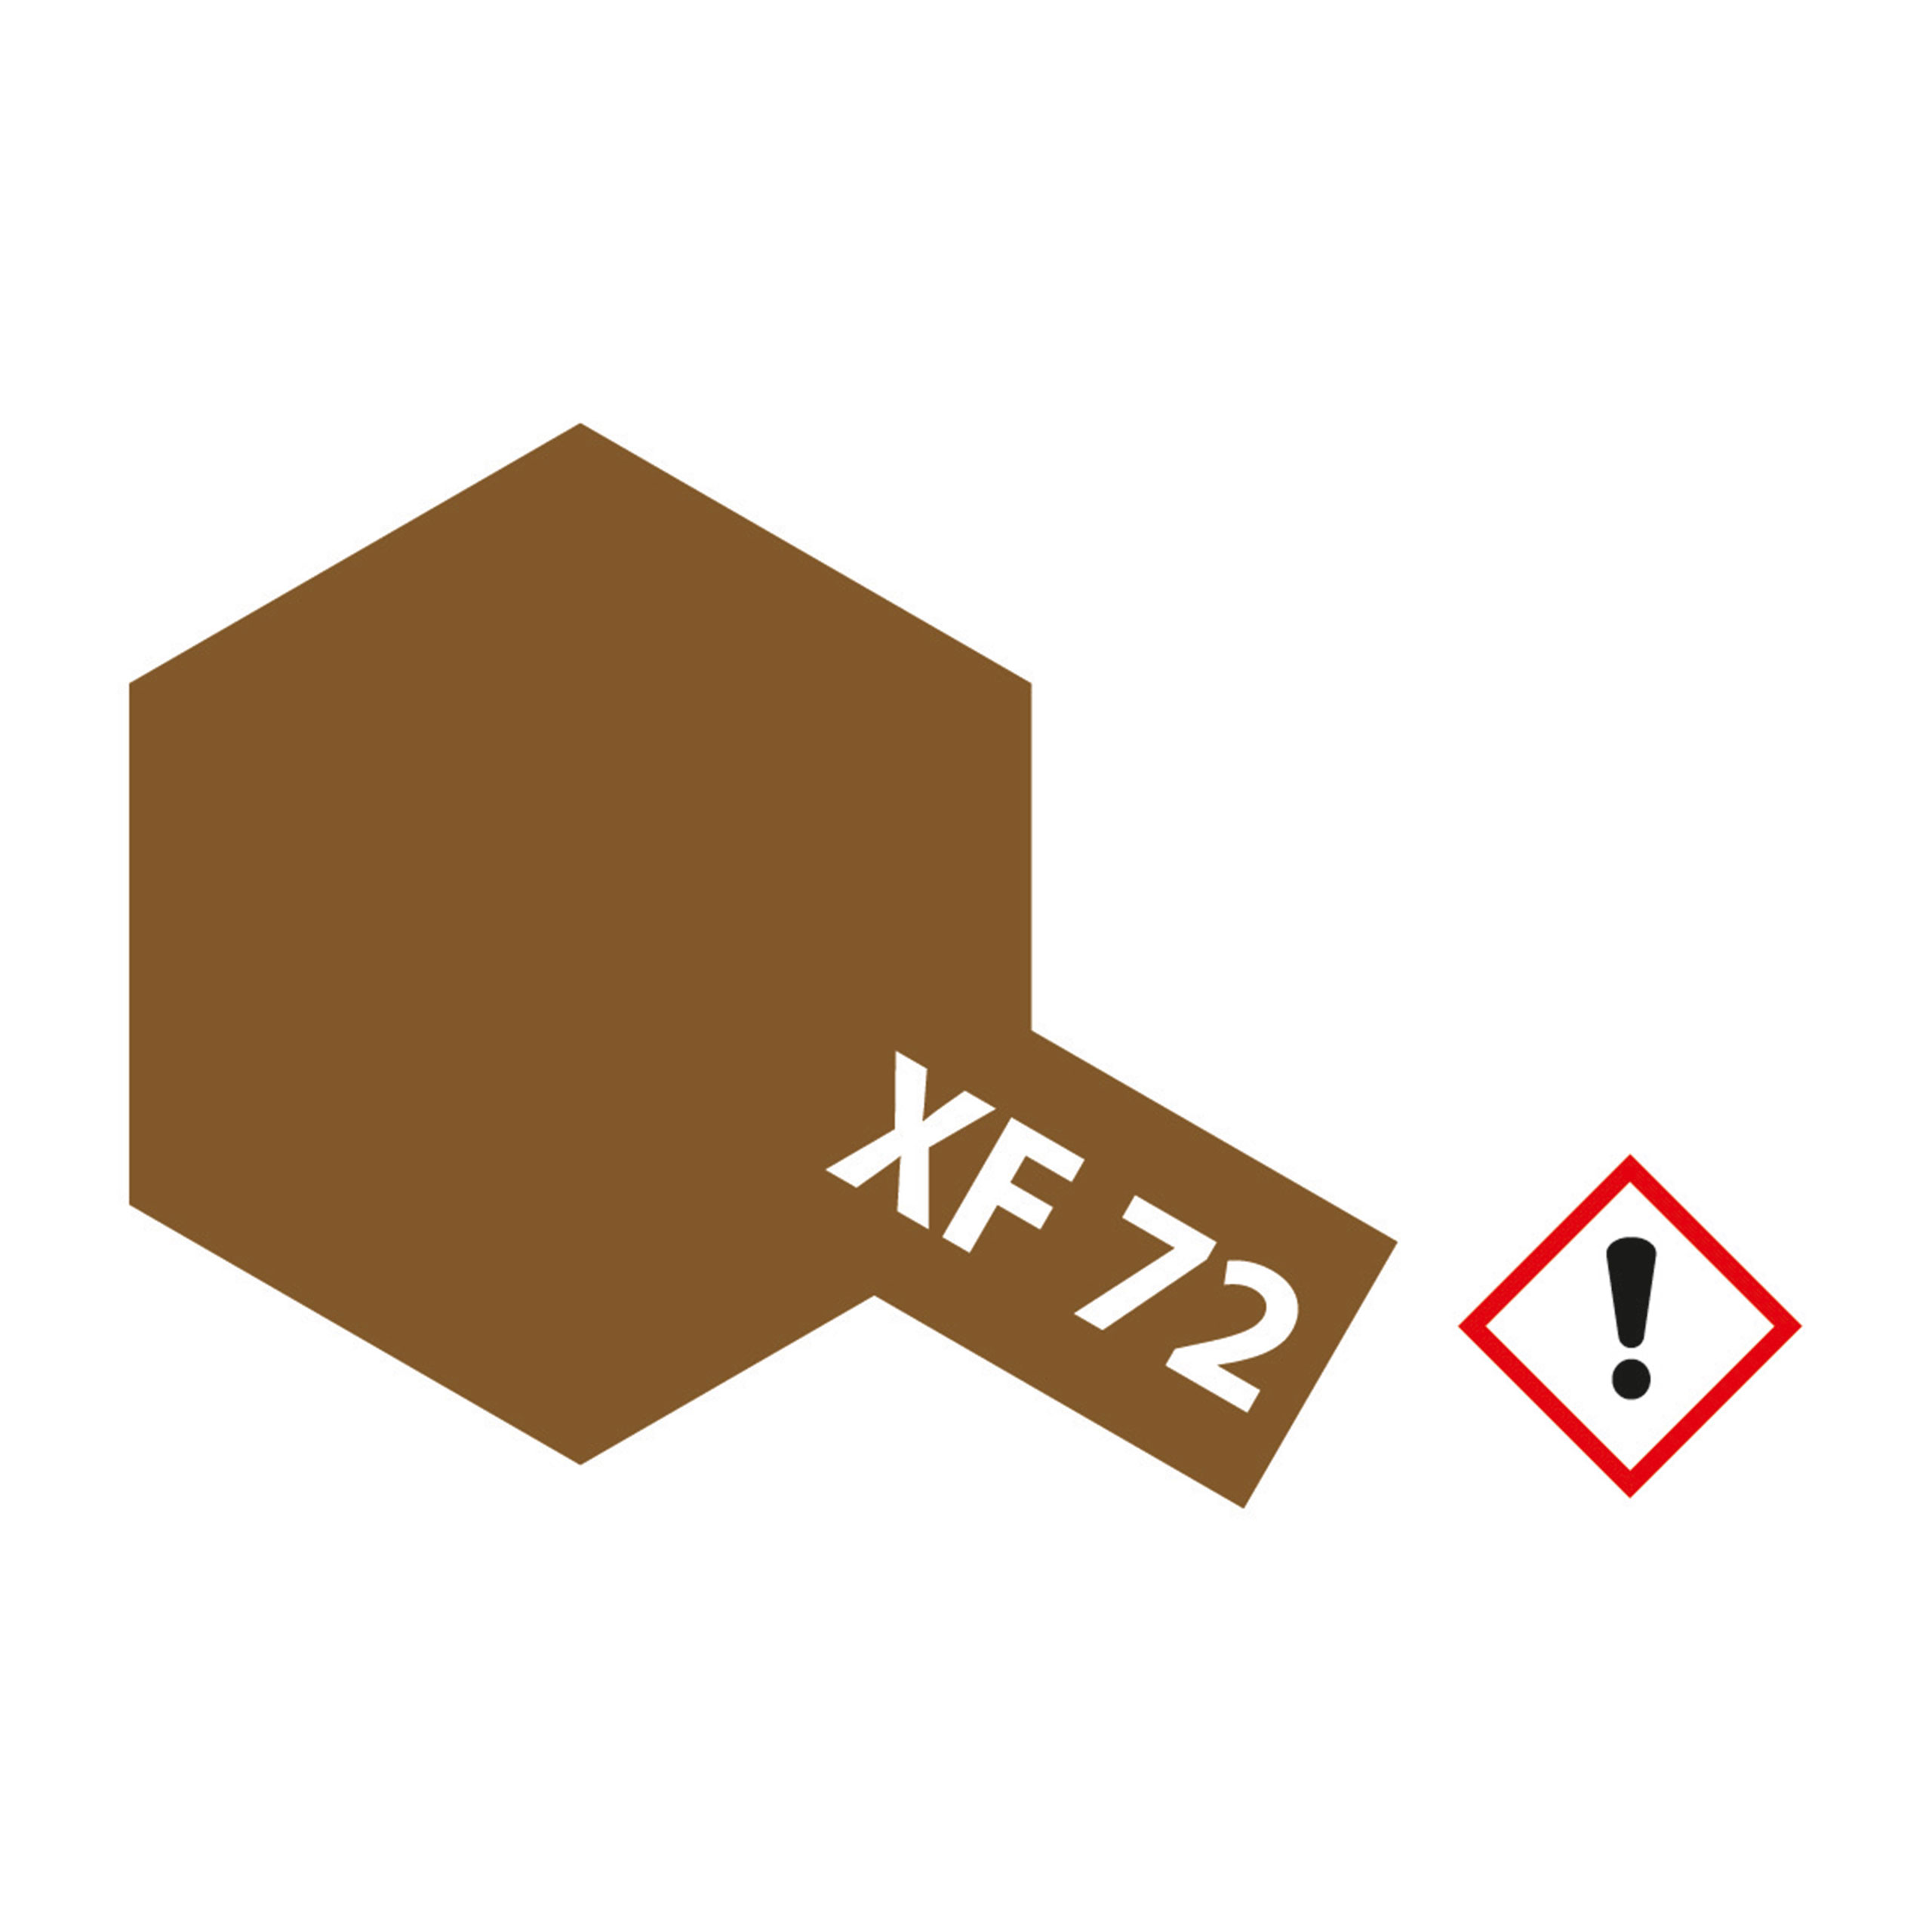 XF-72 Braun JGSDF matt - 10ml Acrylstreichfarbe wasserloeslich Tamiya 300081772